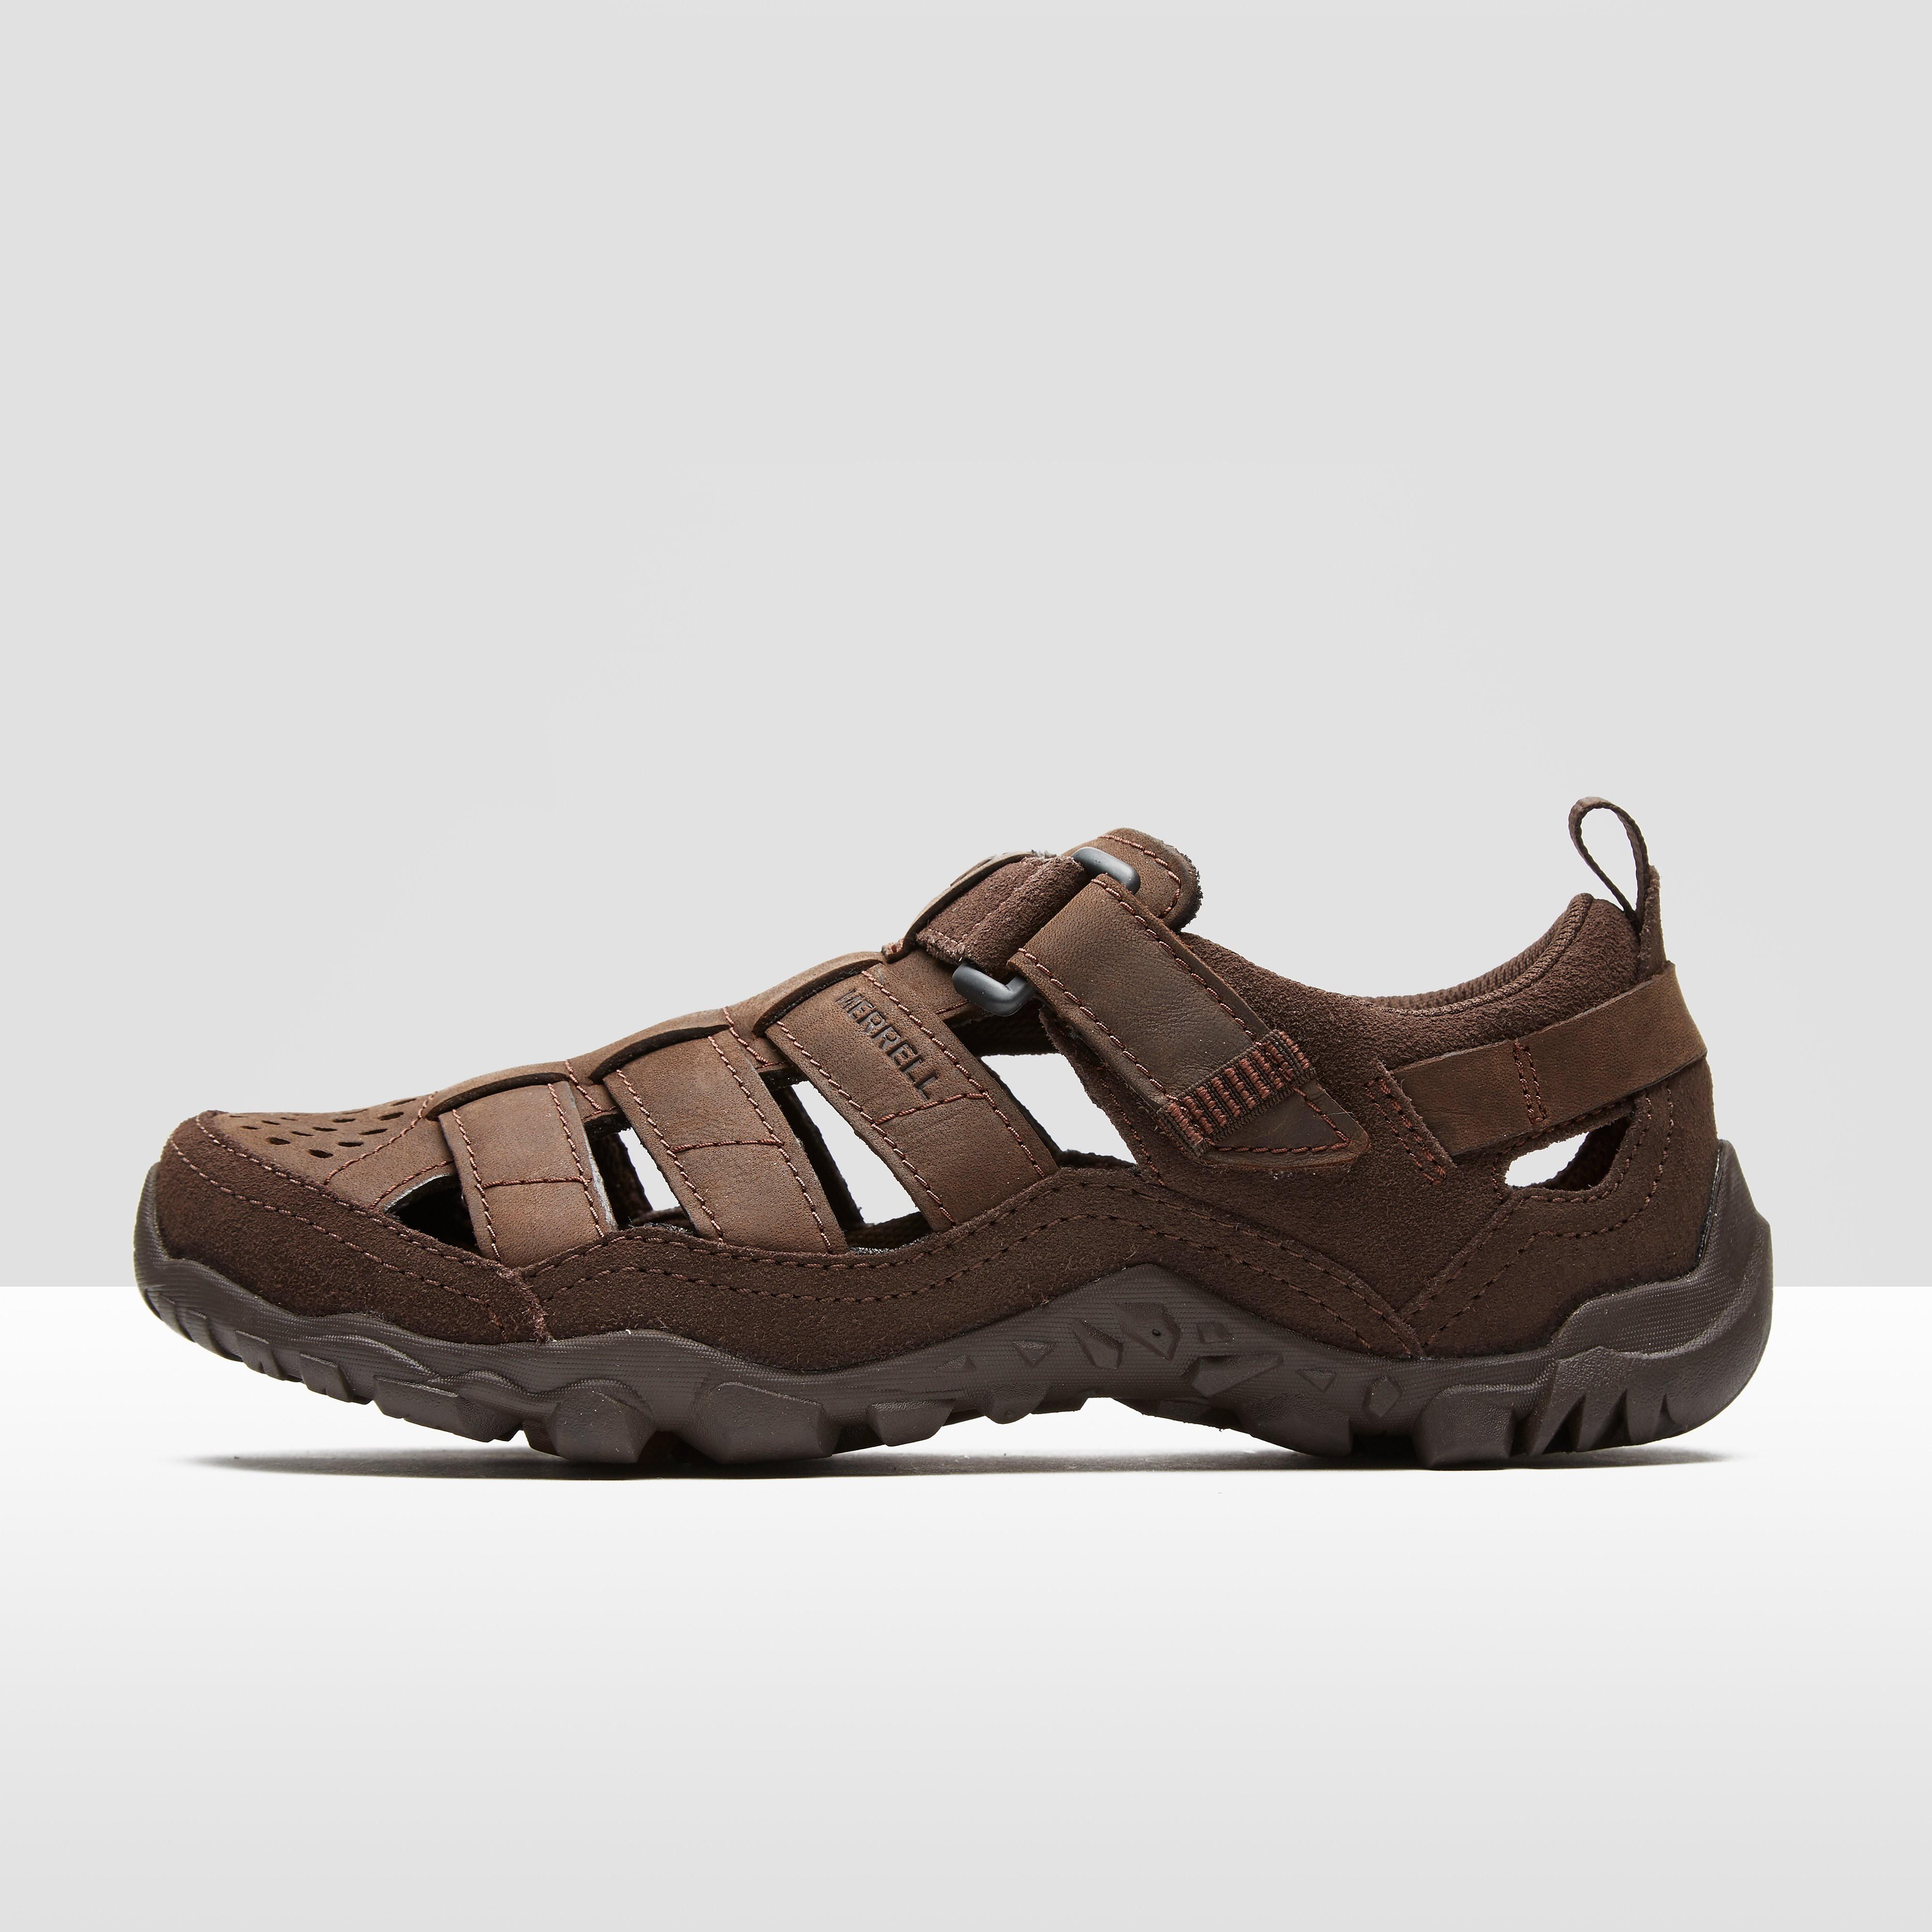 Merrell Telluride Wrap Men's Sandals